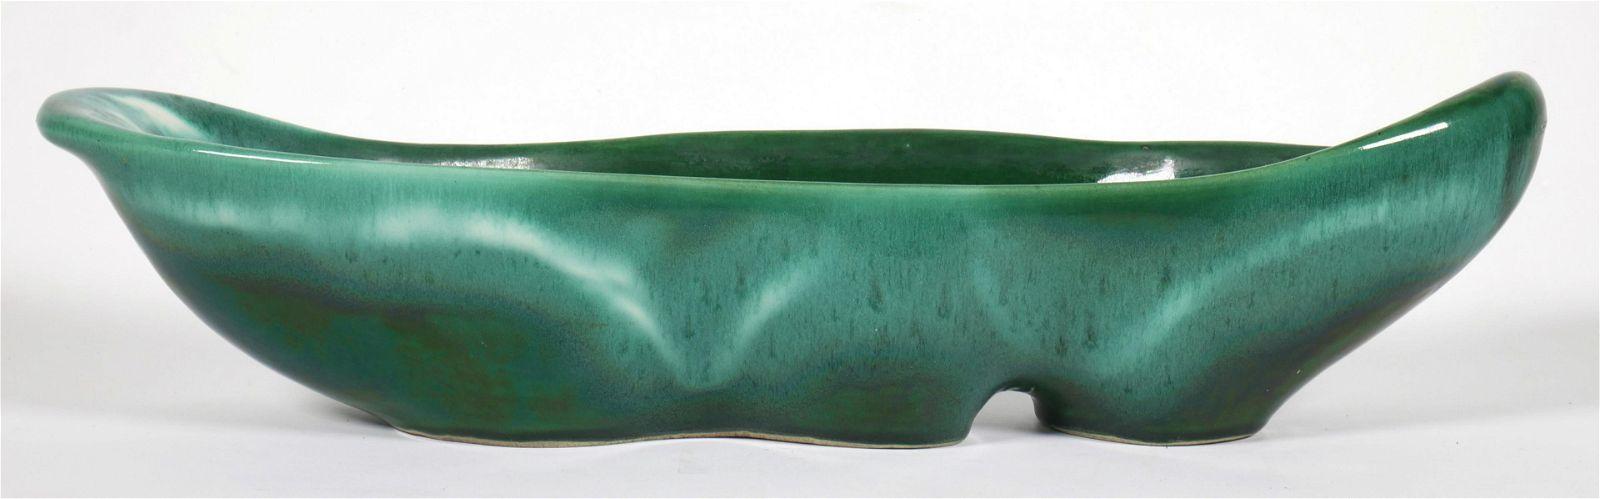 ROYAL HICKMAN Art Pottery Planter Vase